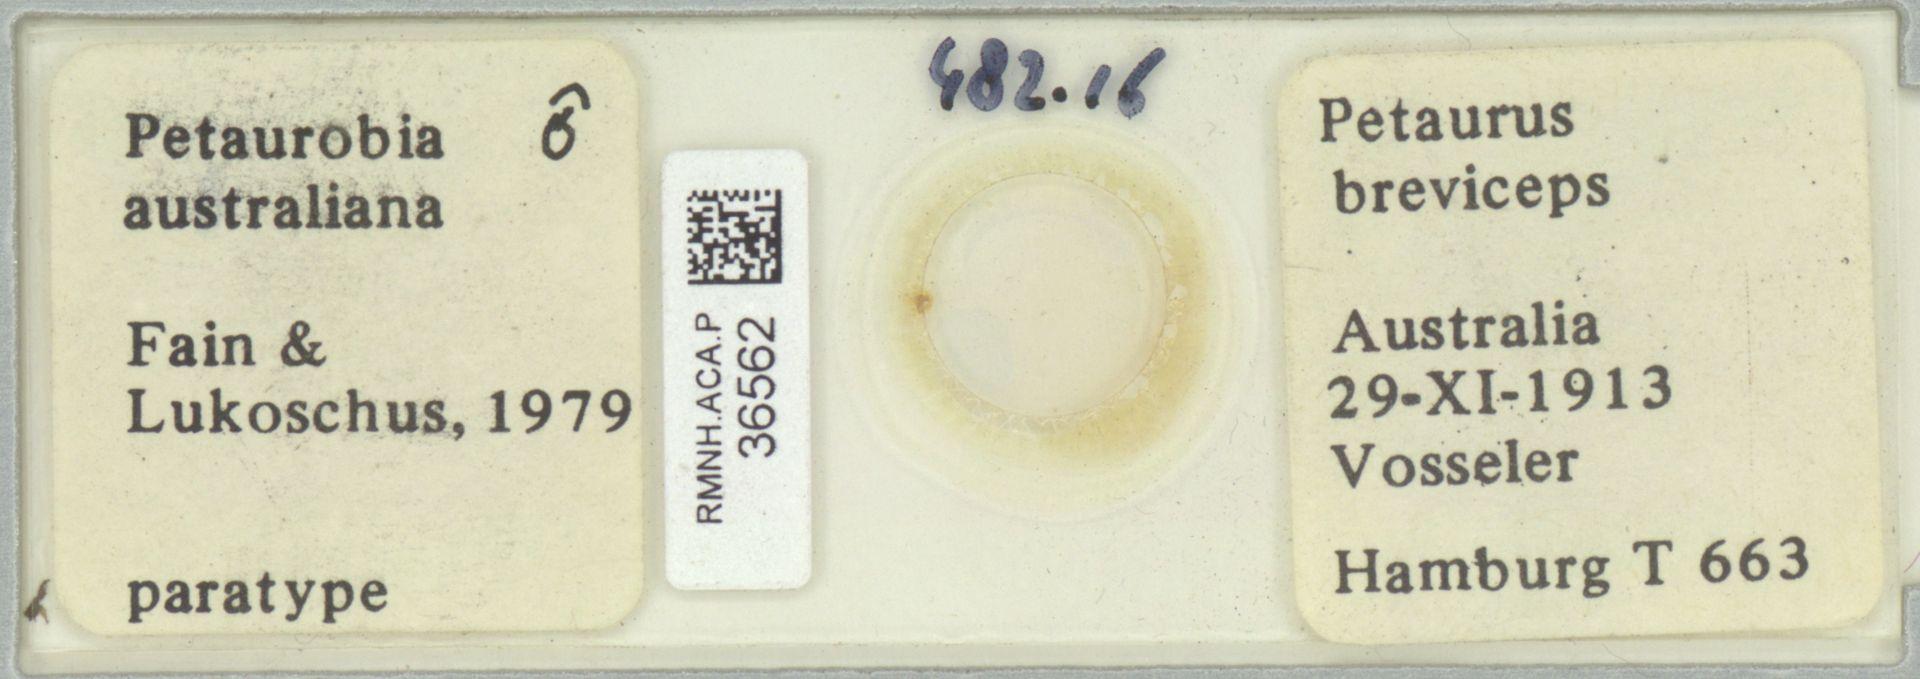 RMNH.ACA.P.36562 | Petaurobia australiana Fain & Lukoschus, 1979